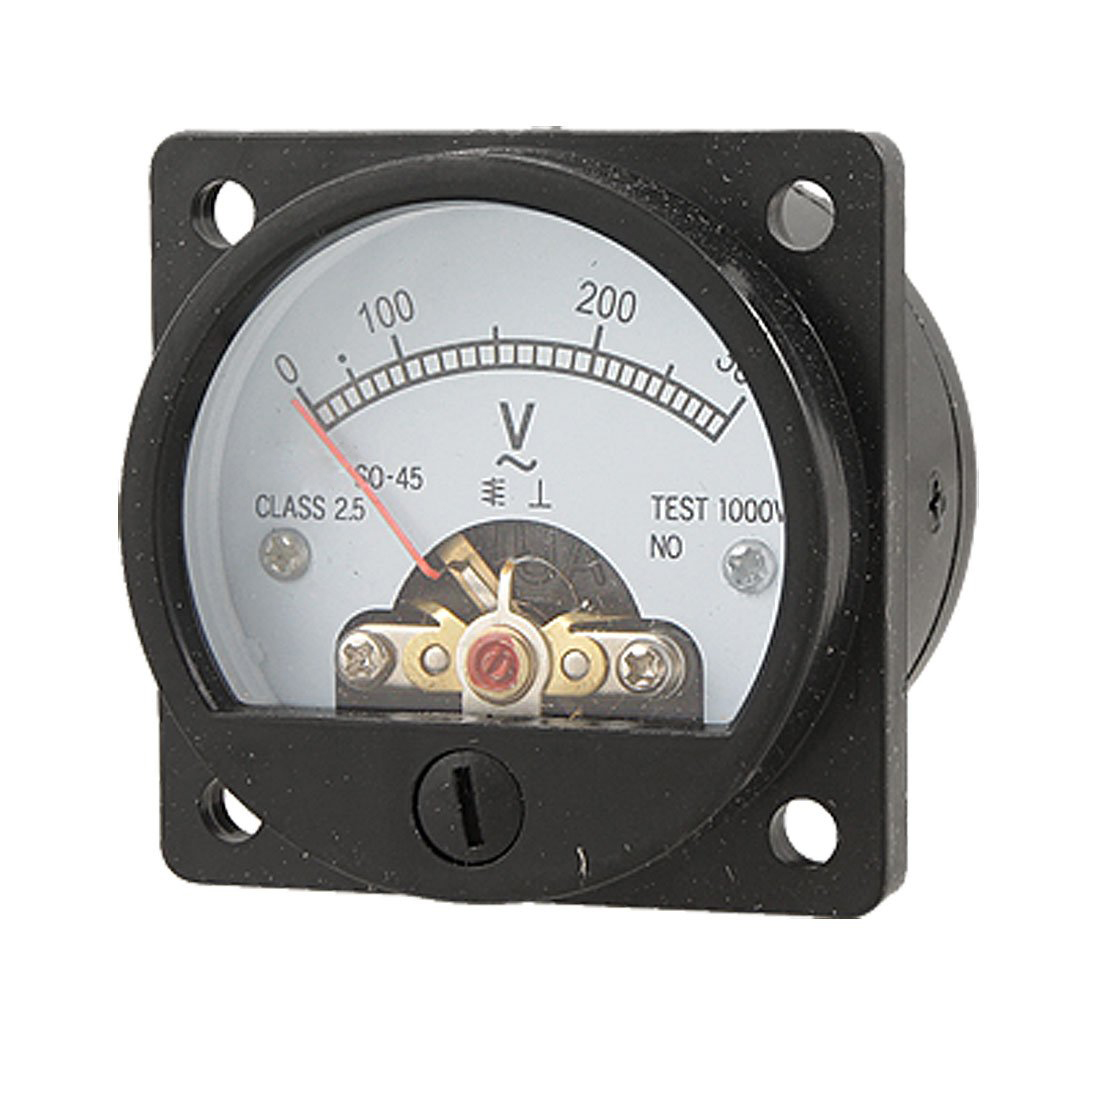 Multimeter Dial Symbols : Thgs hot sale black ac v round analog dial panel